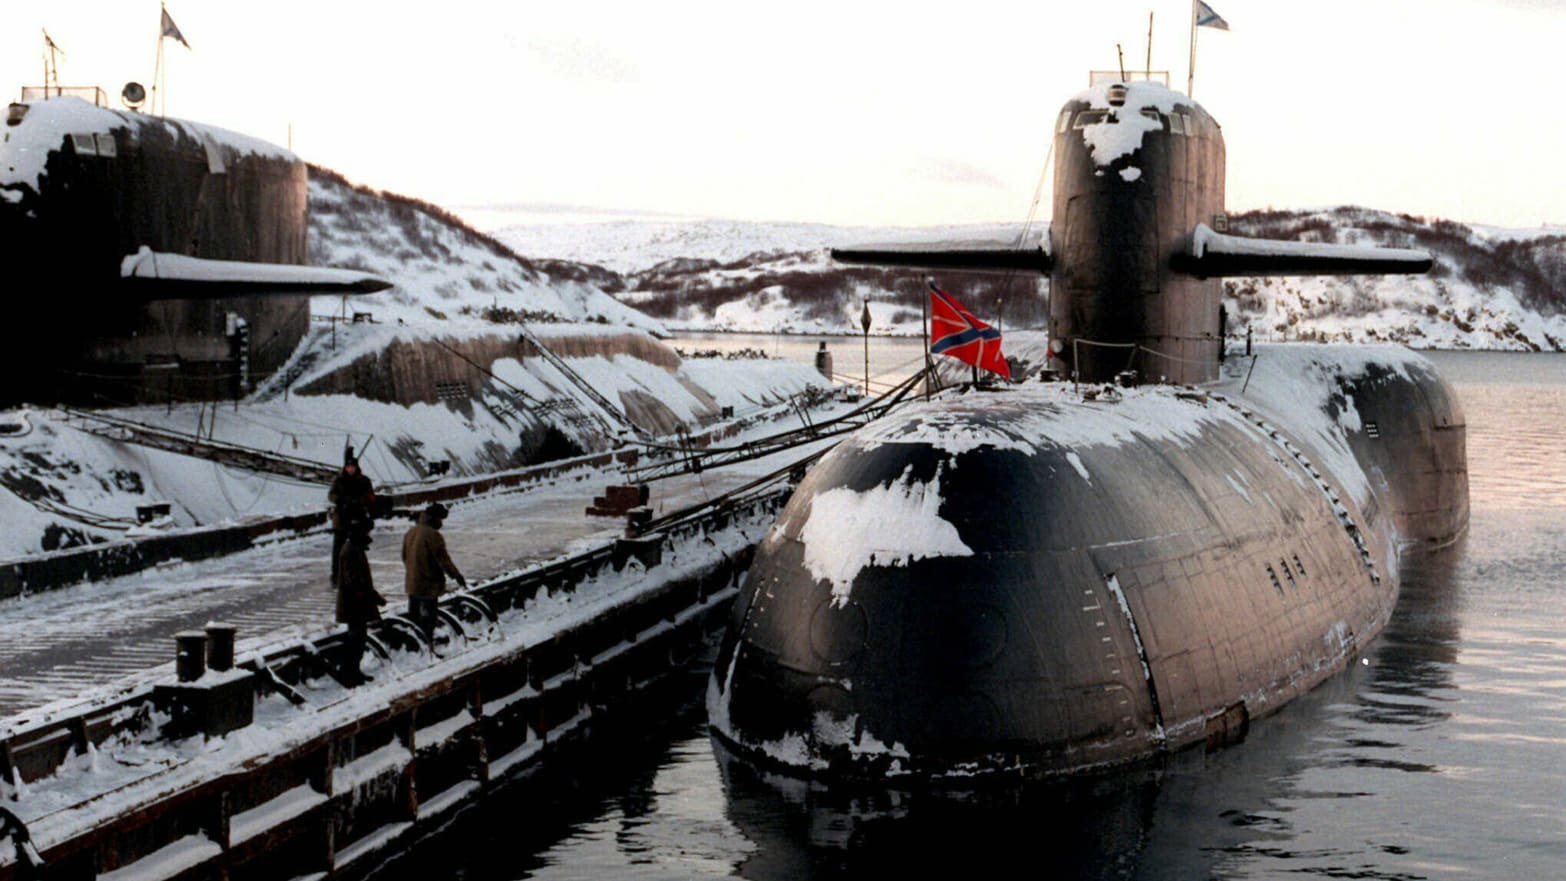 Losharik: What Was That Secret Russian Sub Doing Before It Caught Fire?